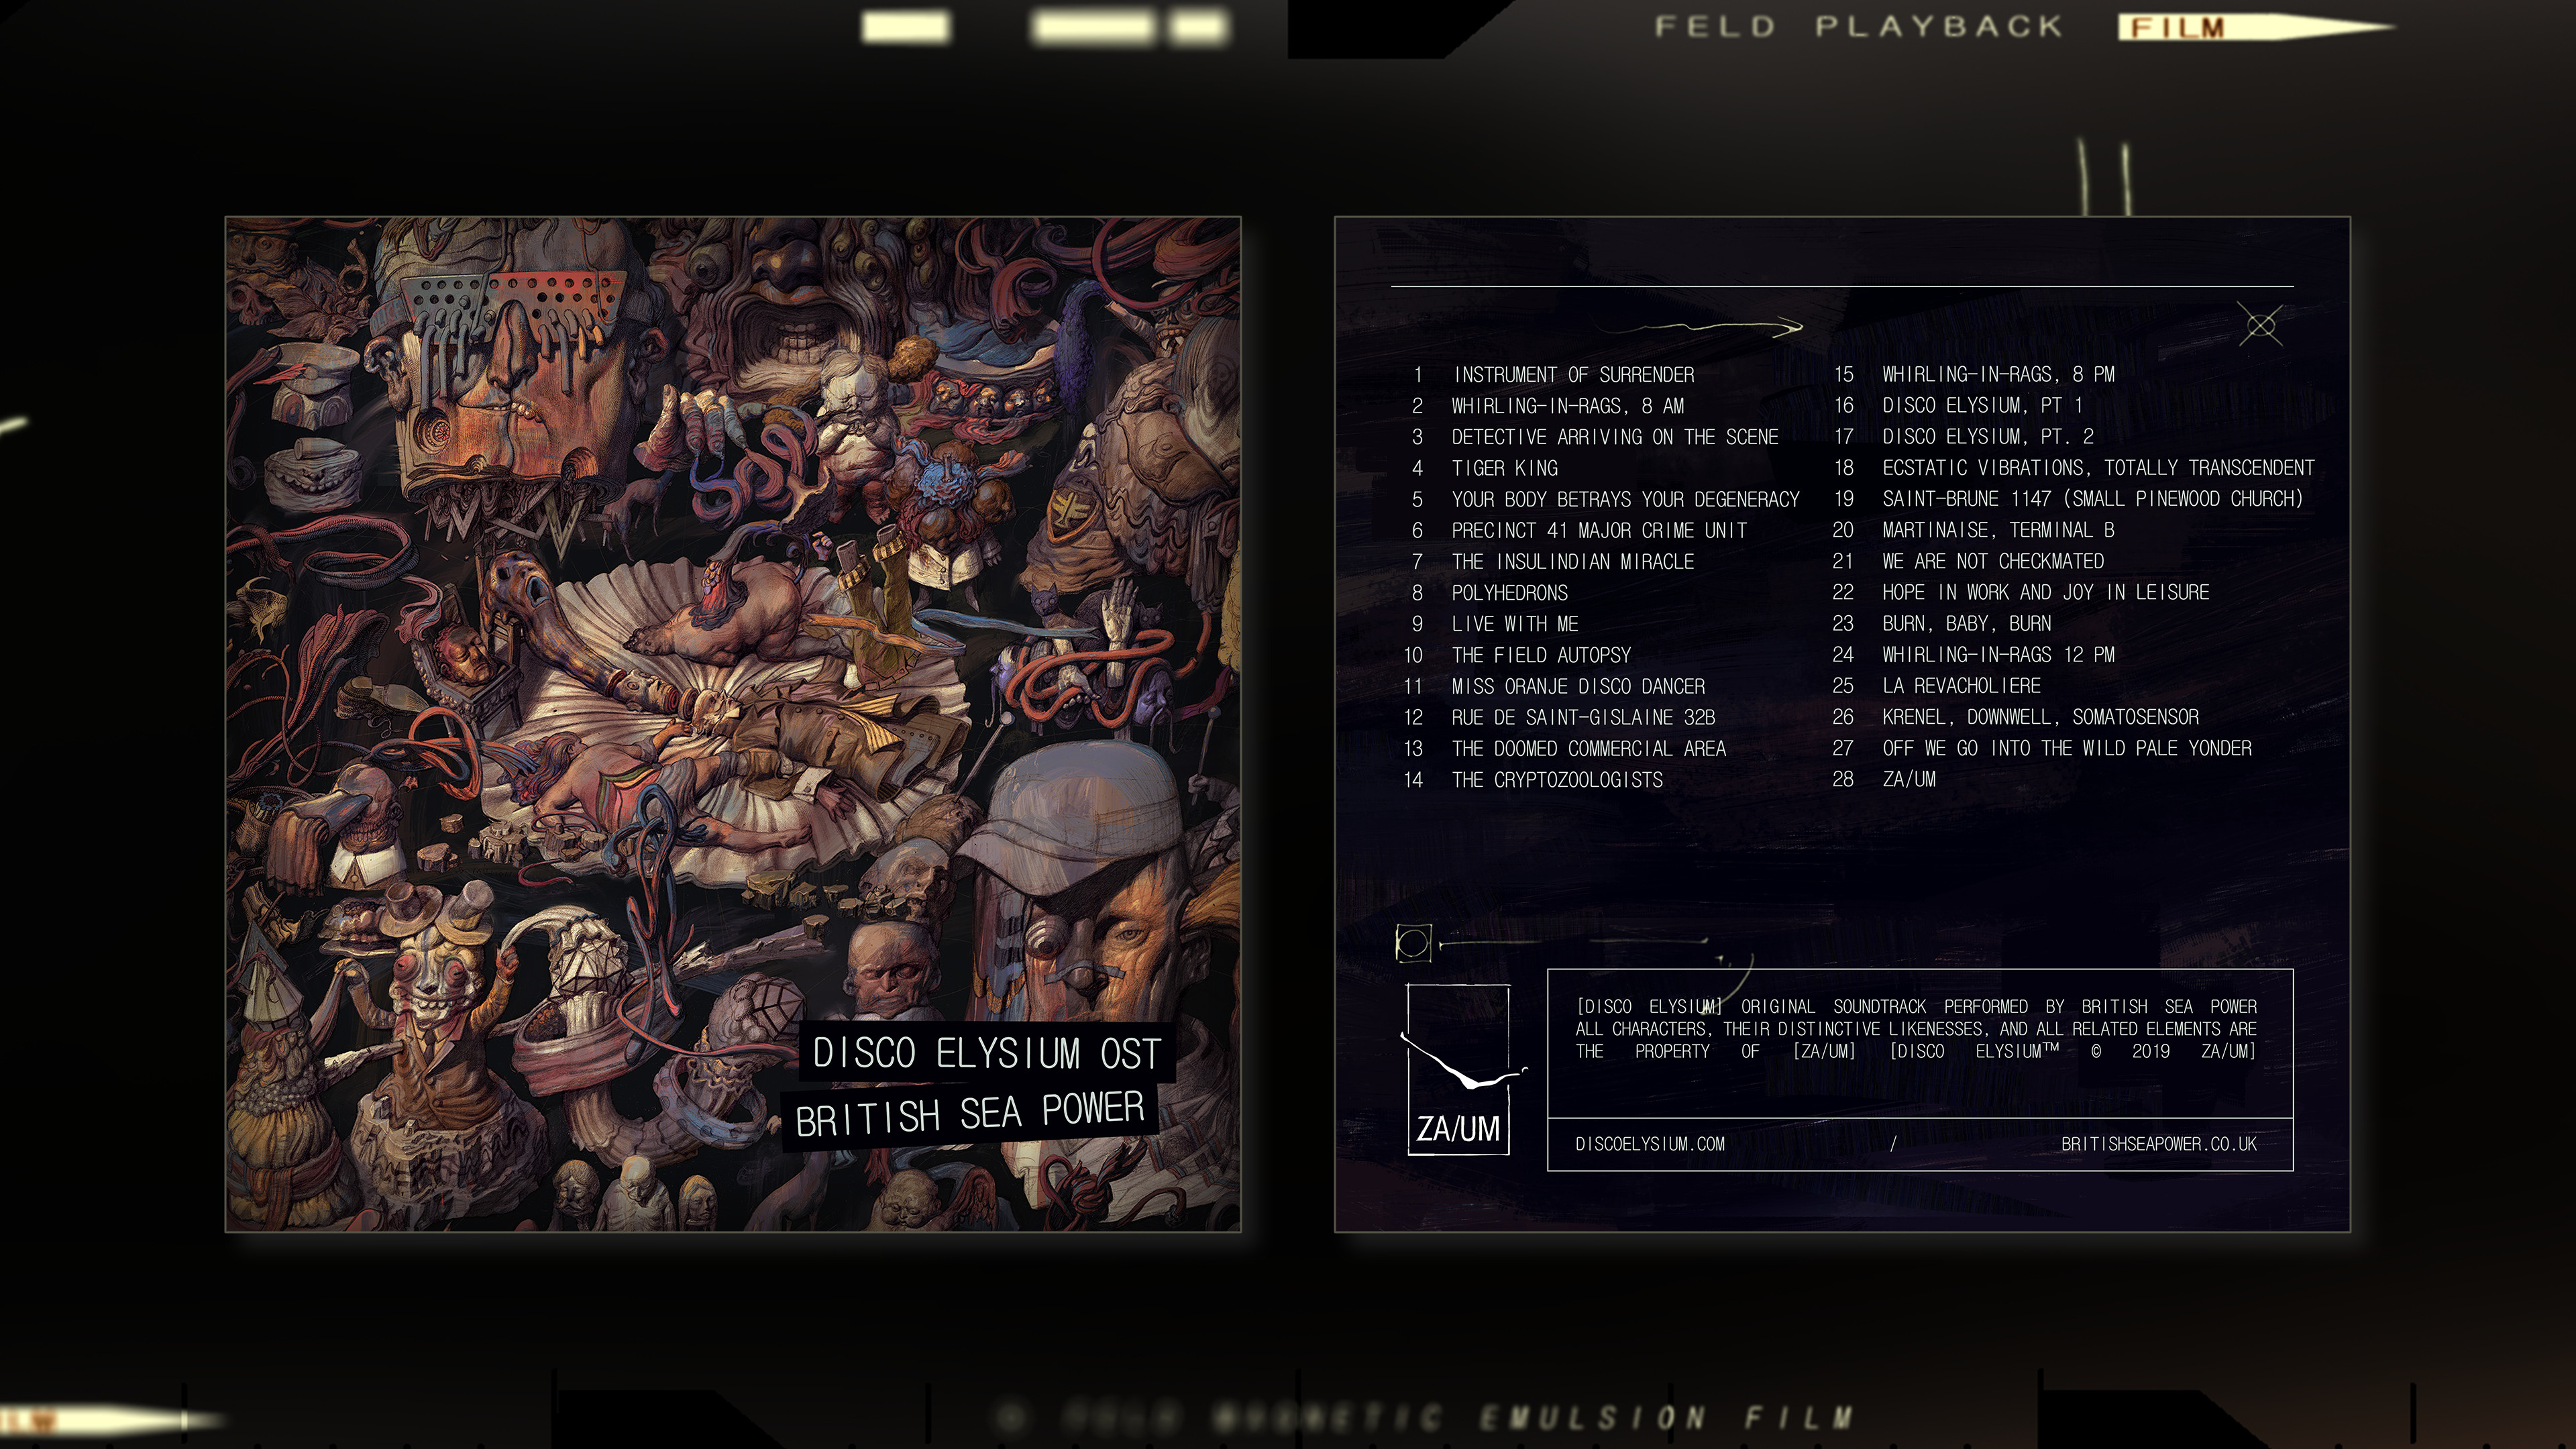 Disco Elysium Soundtrack screenshot